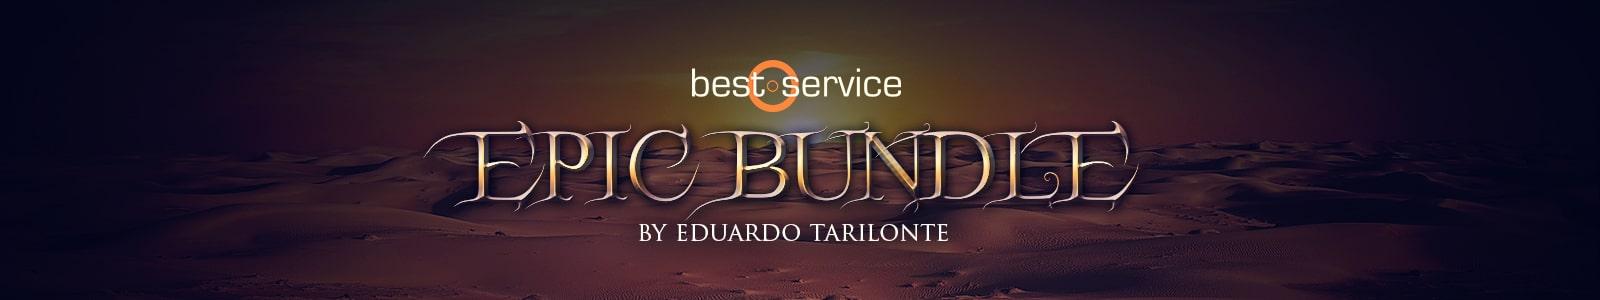 epic bundle by eduardo tarilonte